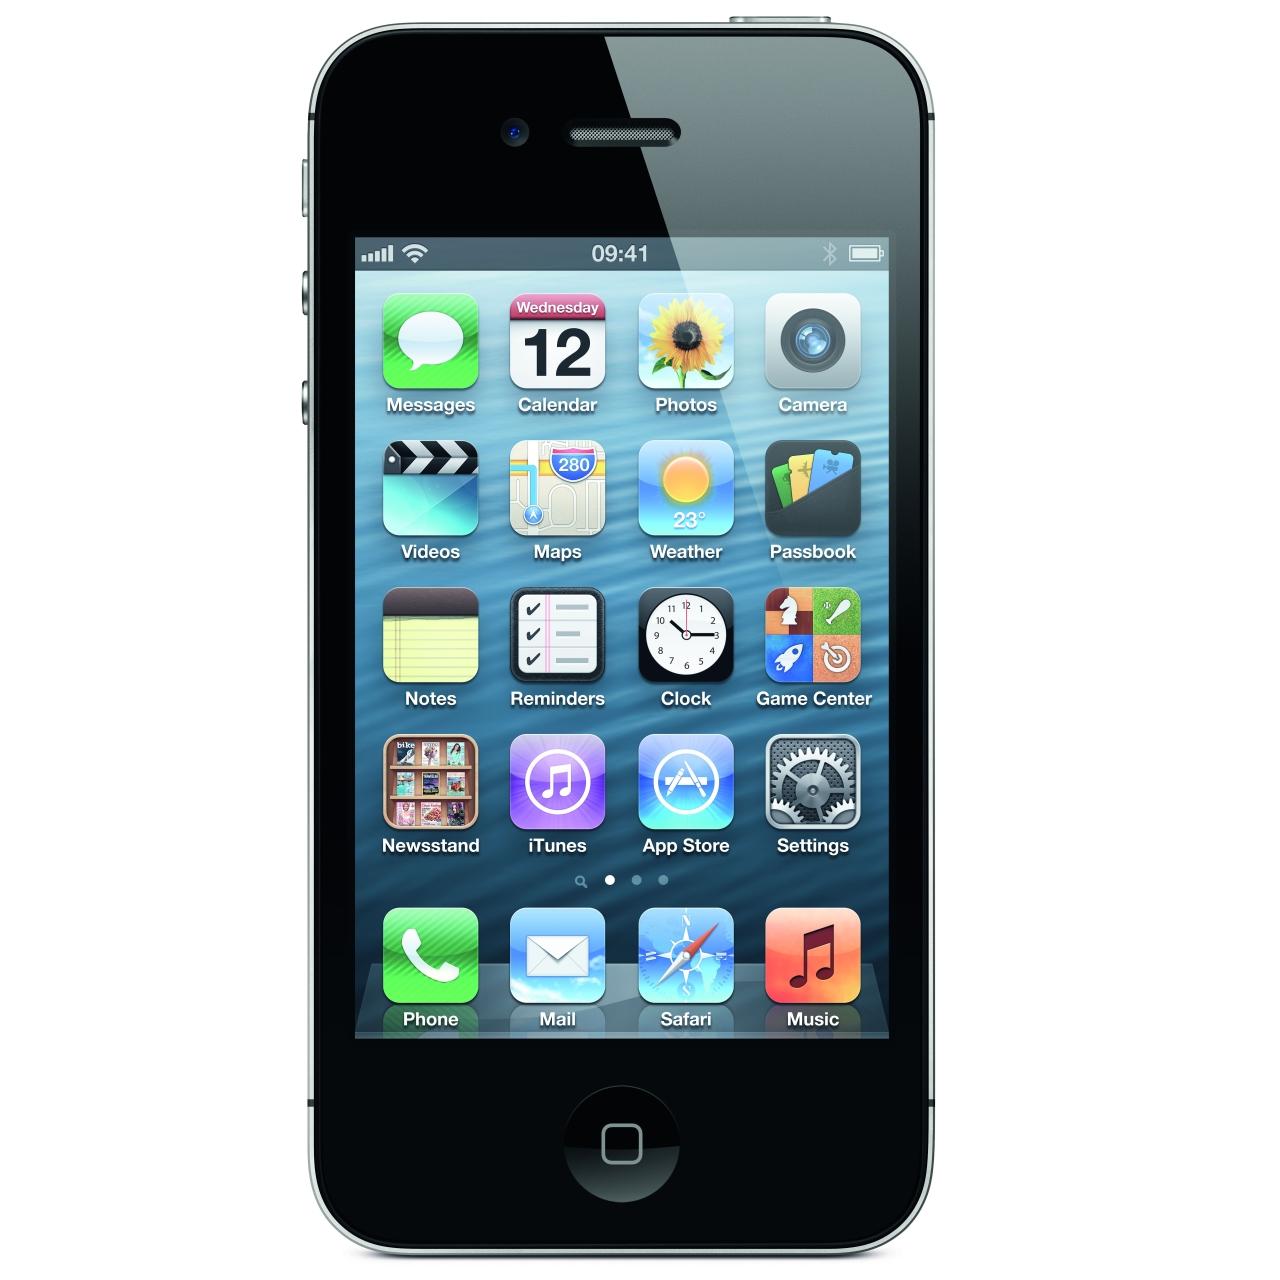 brand new apple iphone 4 8gb unlocked sealed. Black Bedroom Furniture Sets. Home Design Ideas